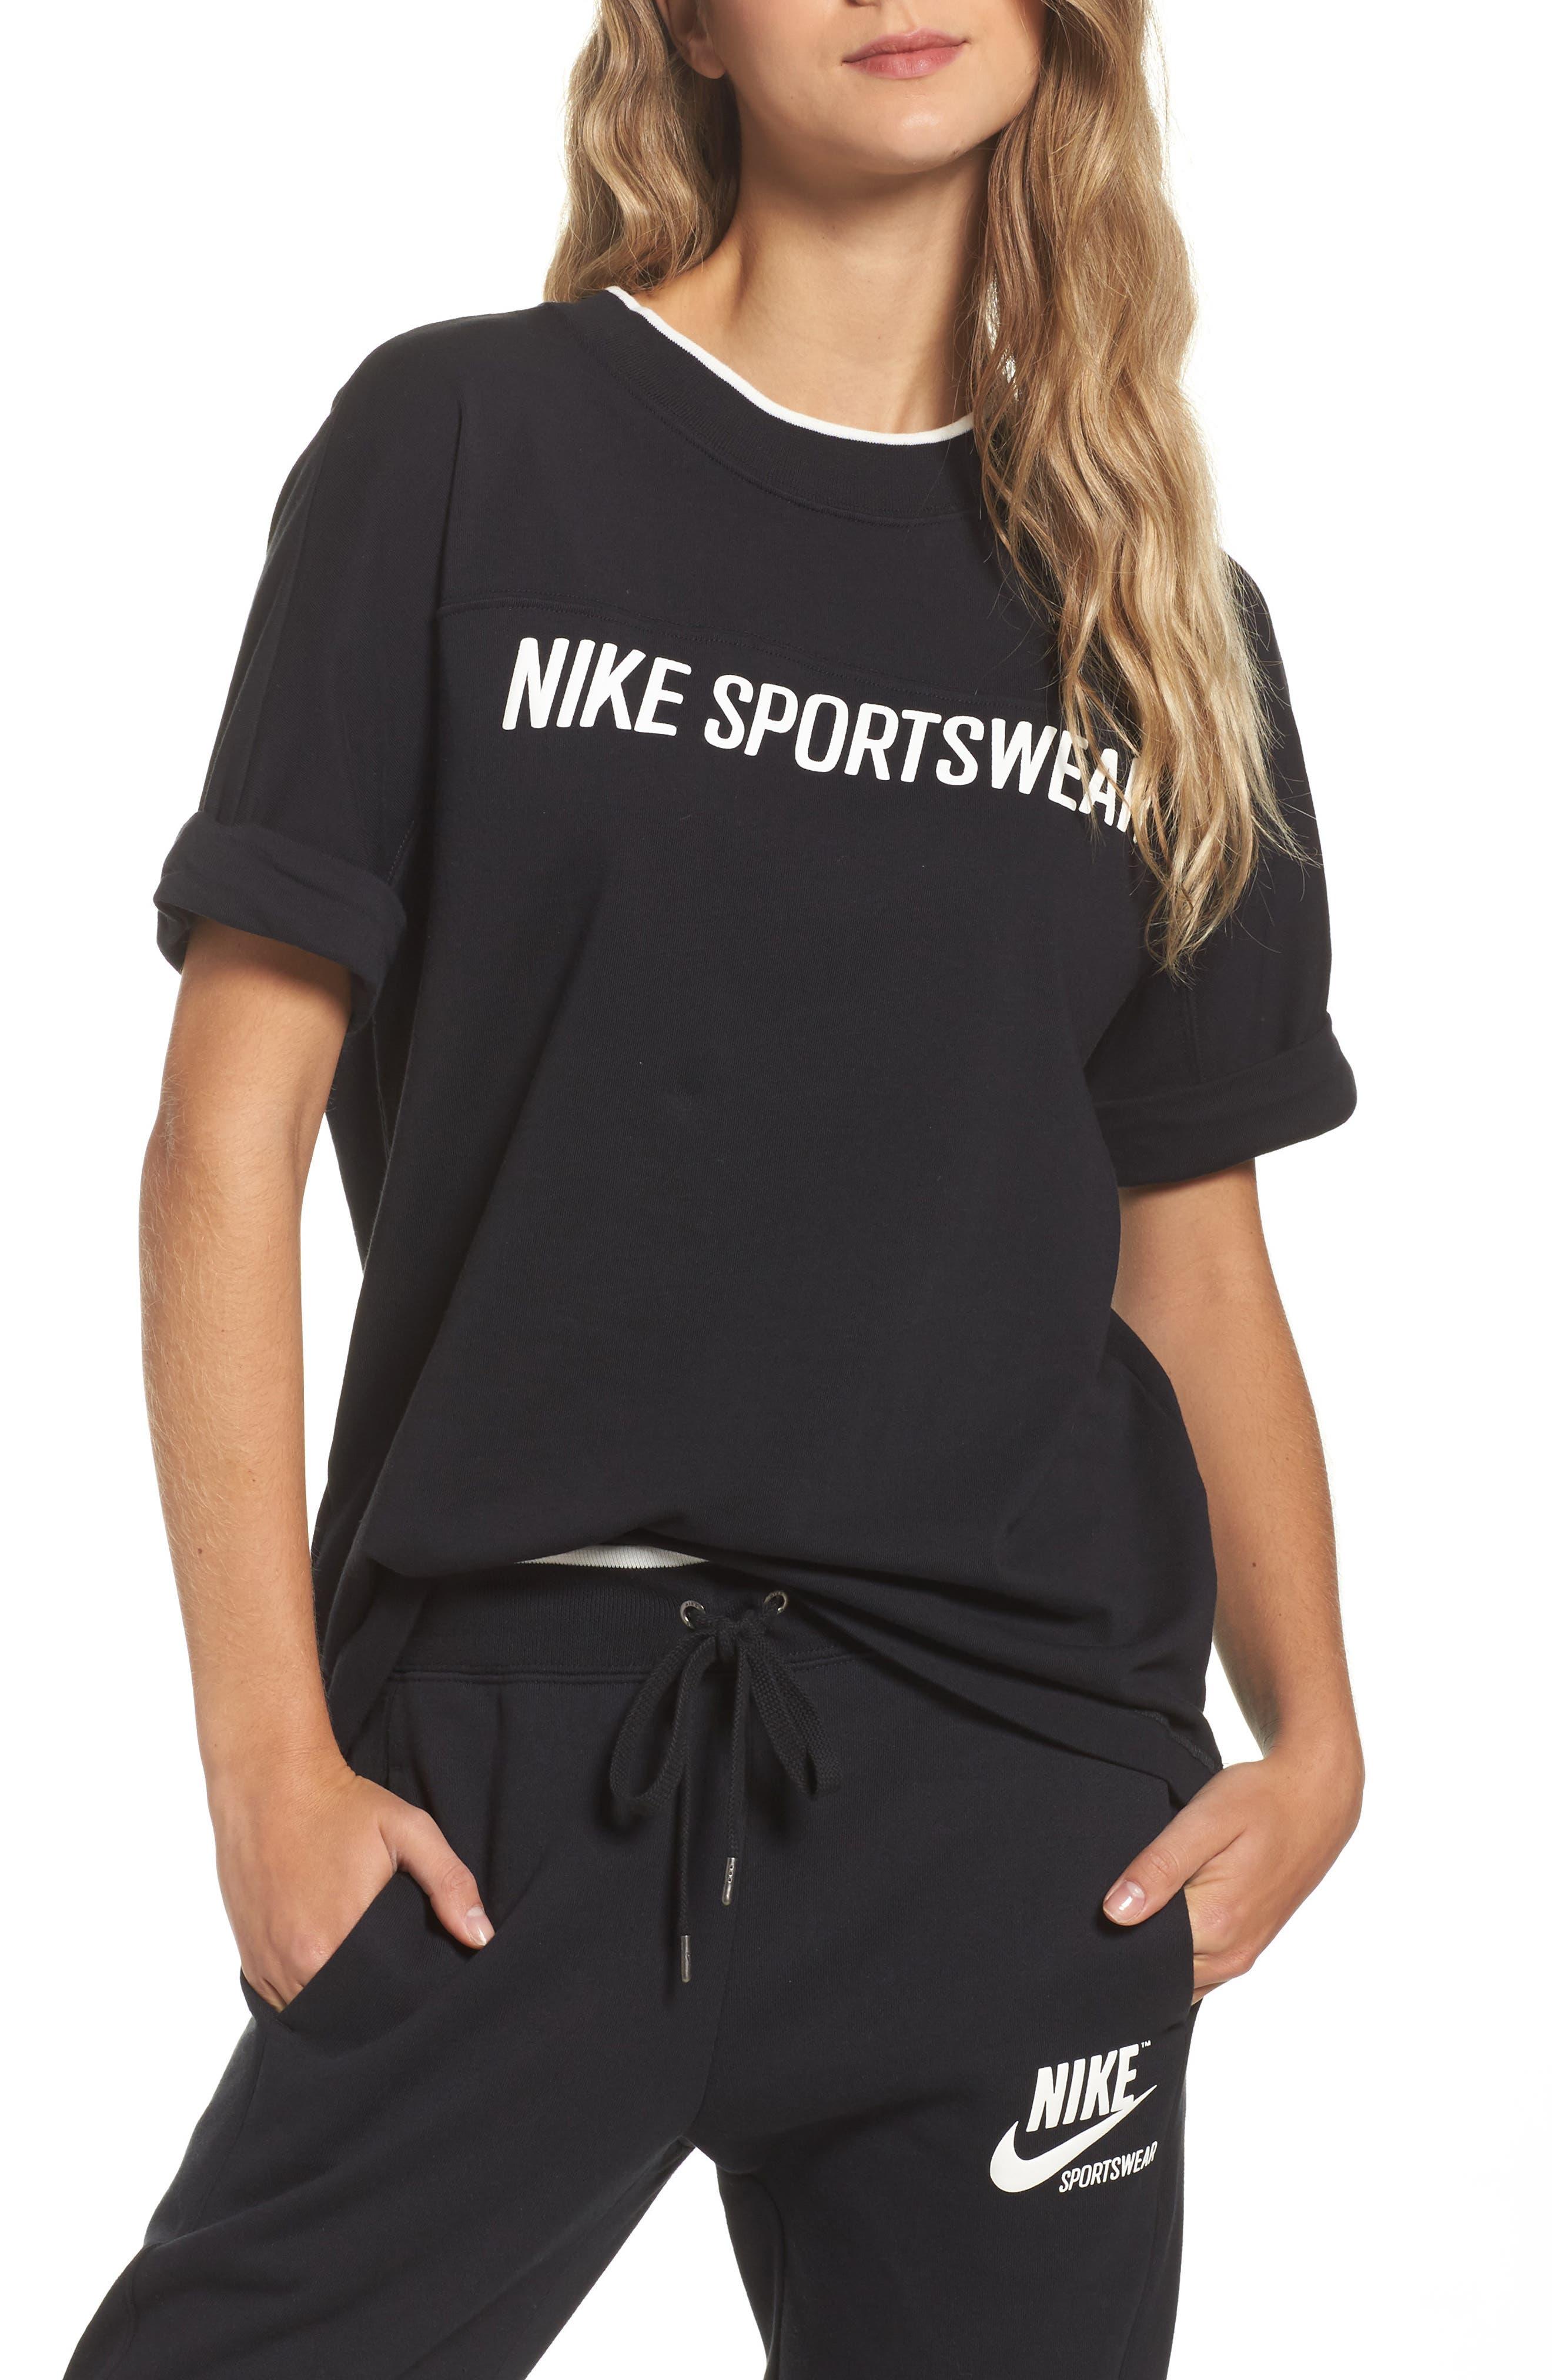 Sportswear Archive Tee,                         Main,                         color, Black/ Black/ Sail